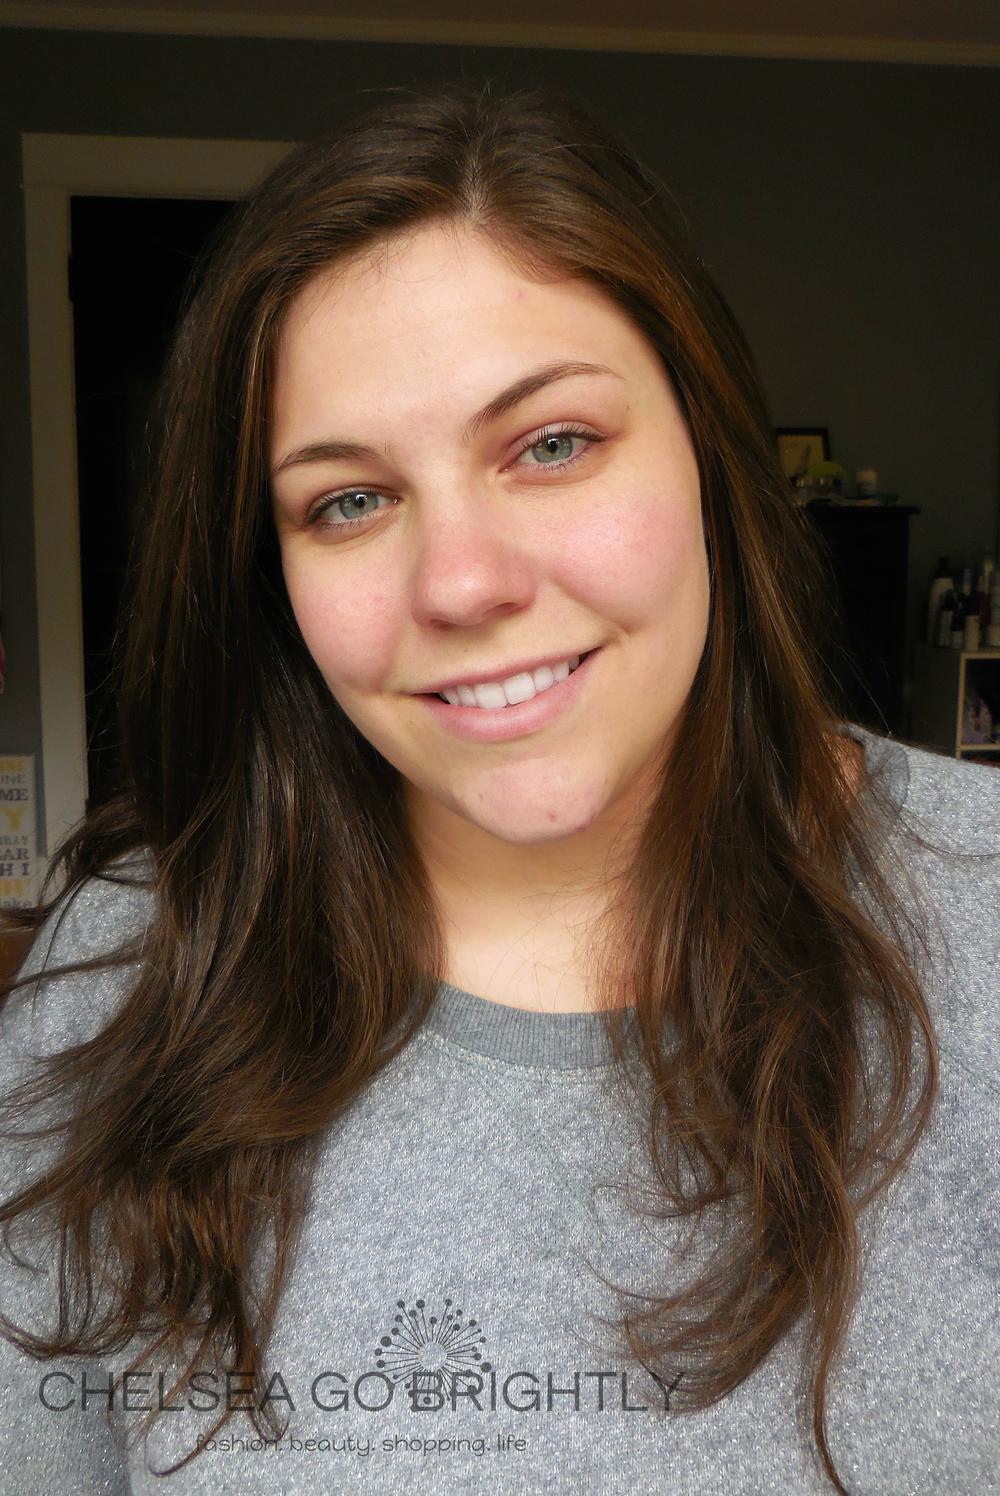 Before - No Makeup